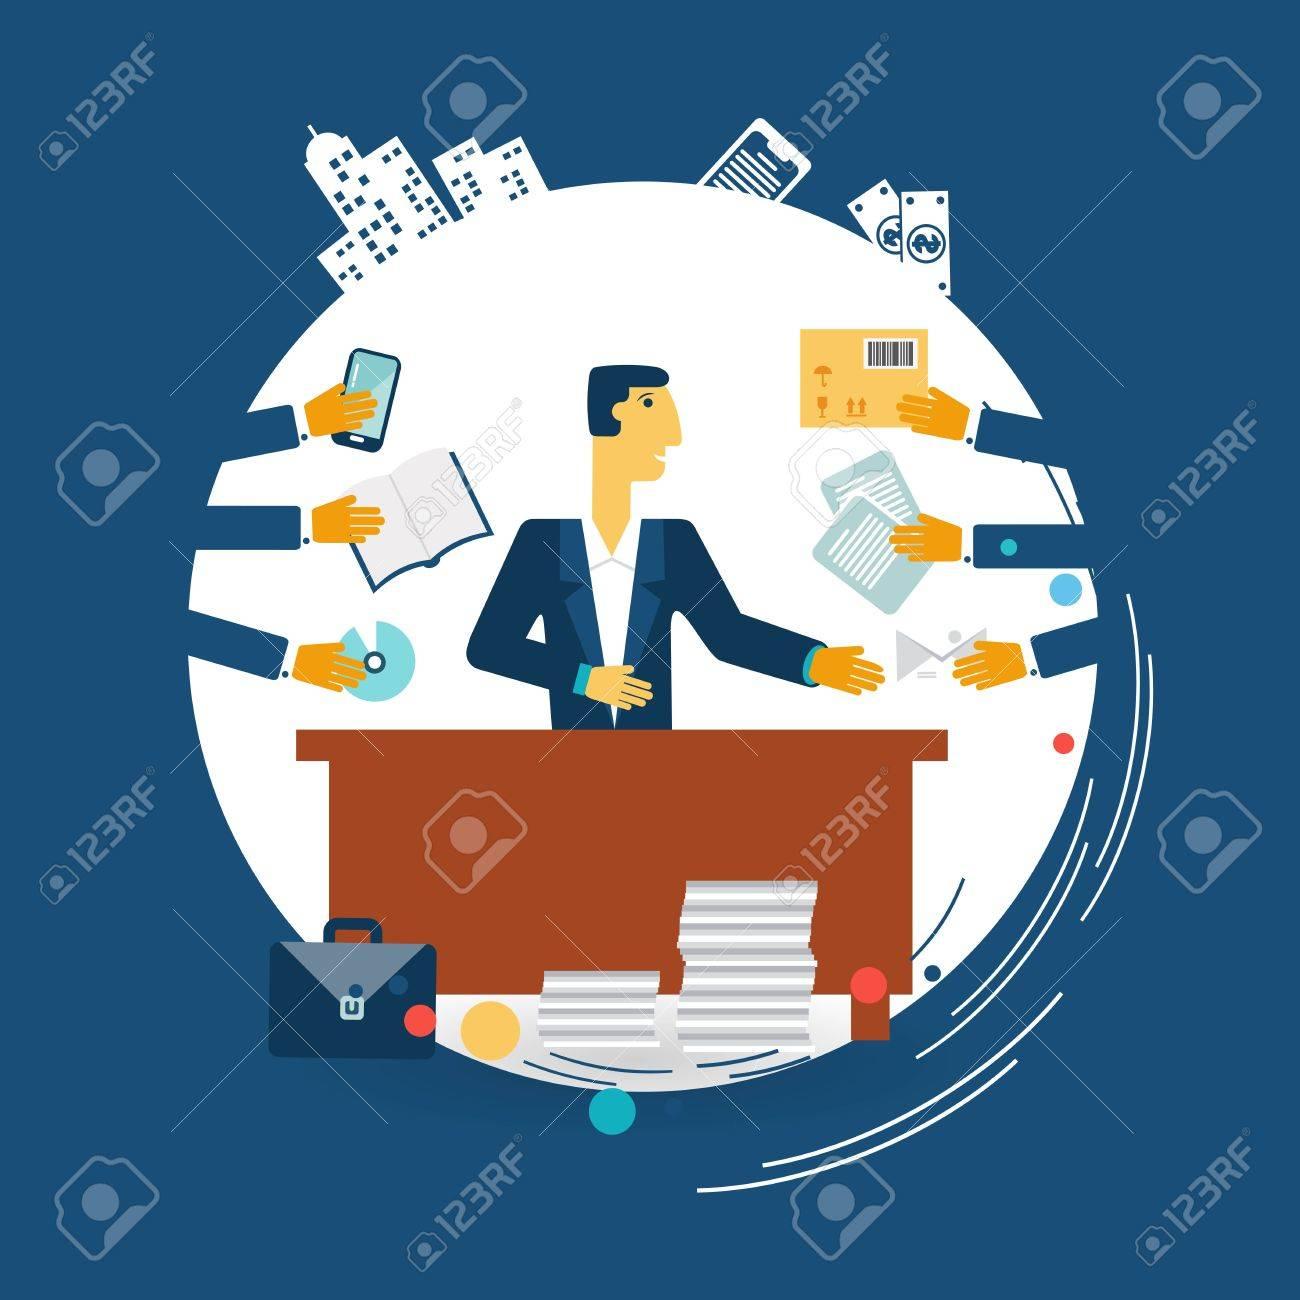 exhausted businessman work illustration Standard-Bild - 32472112